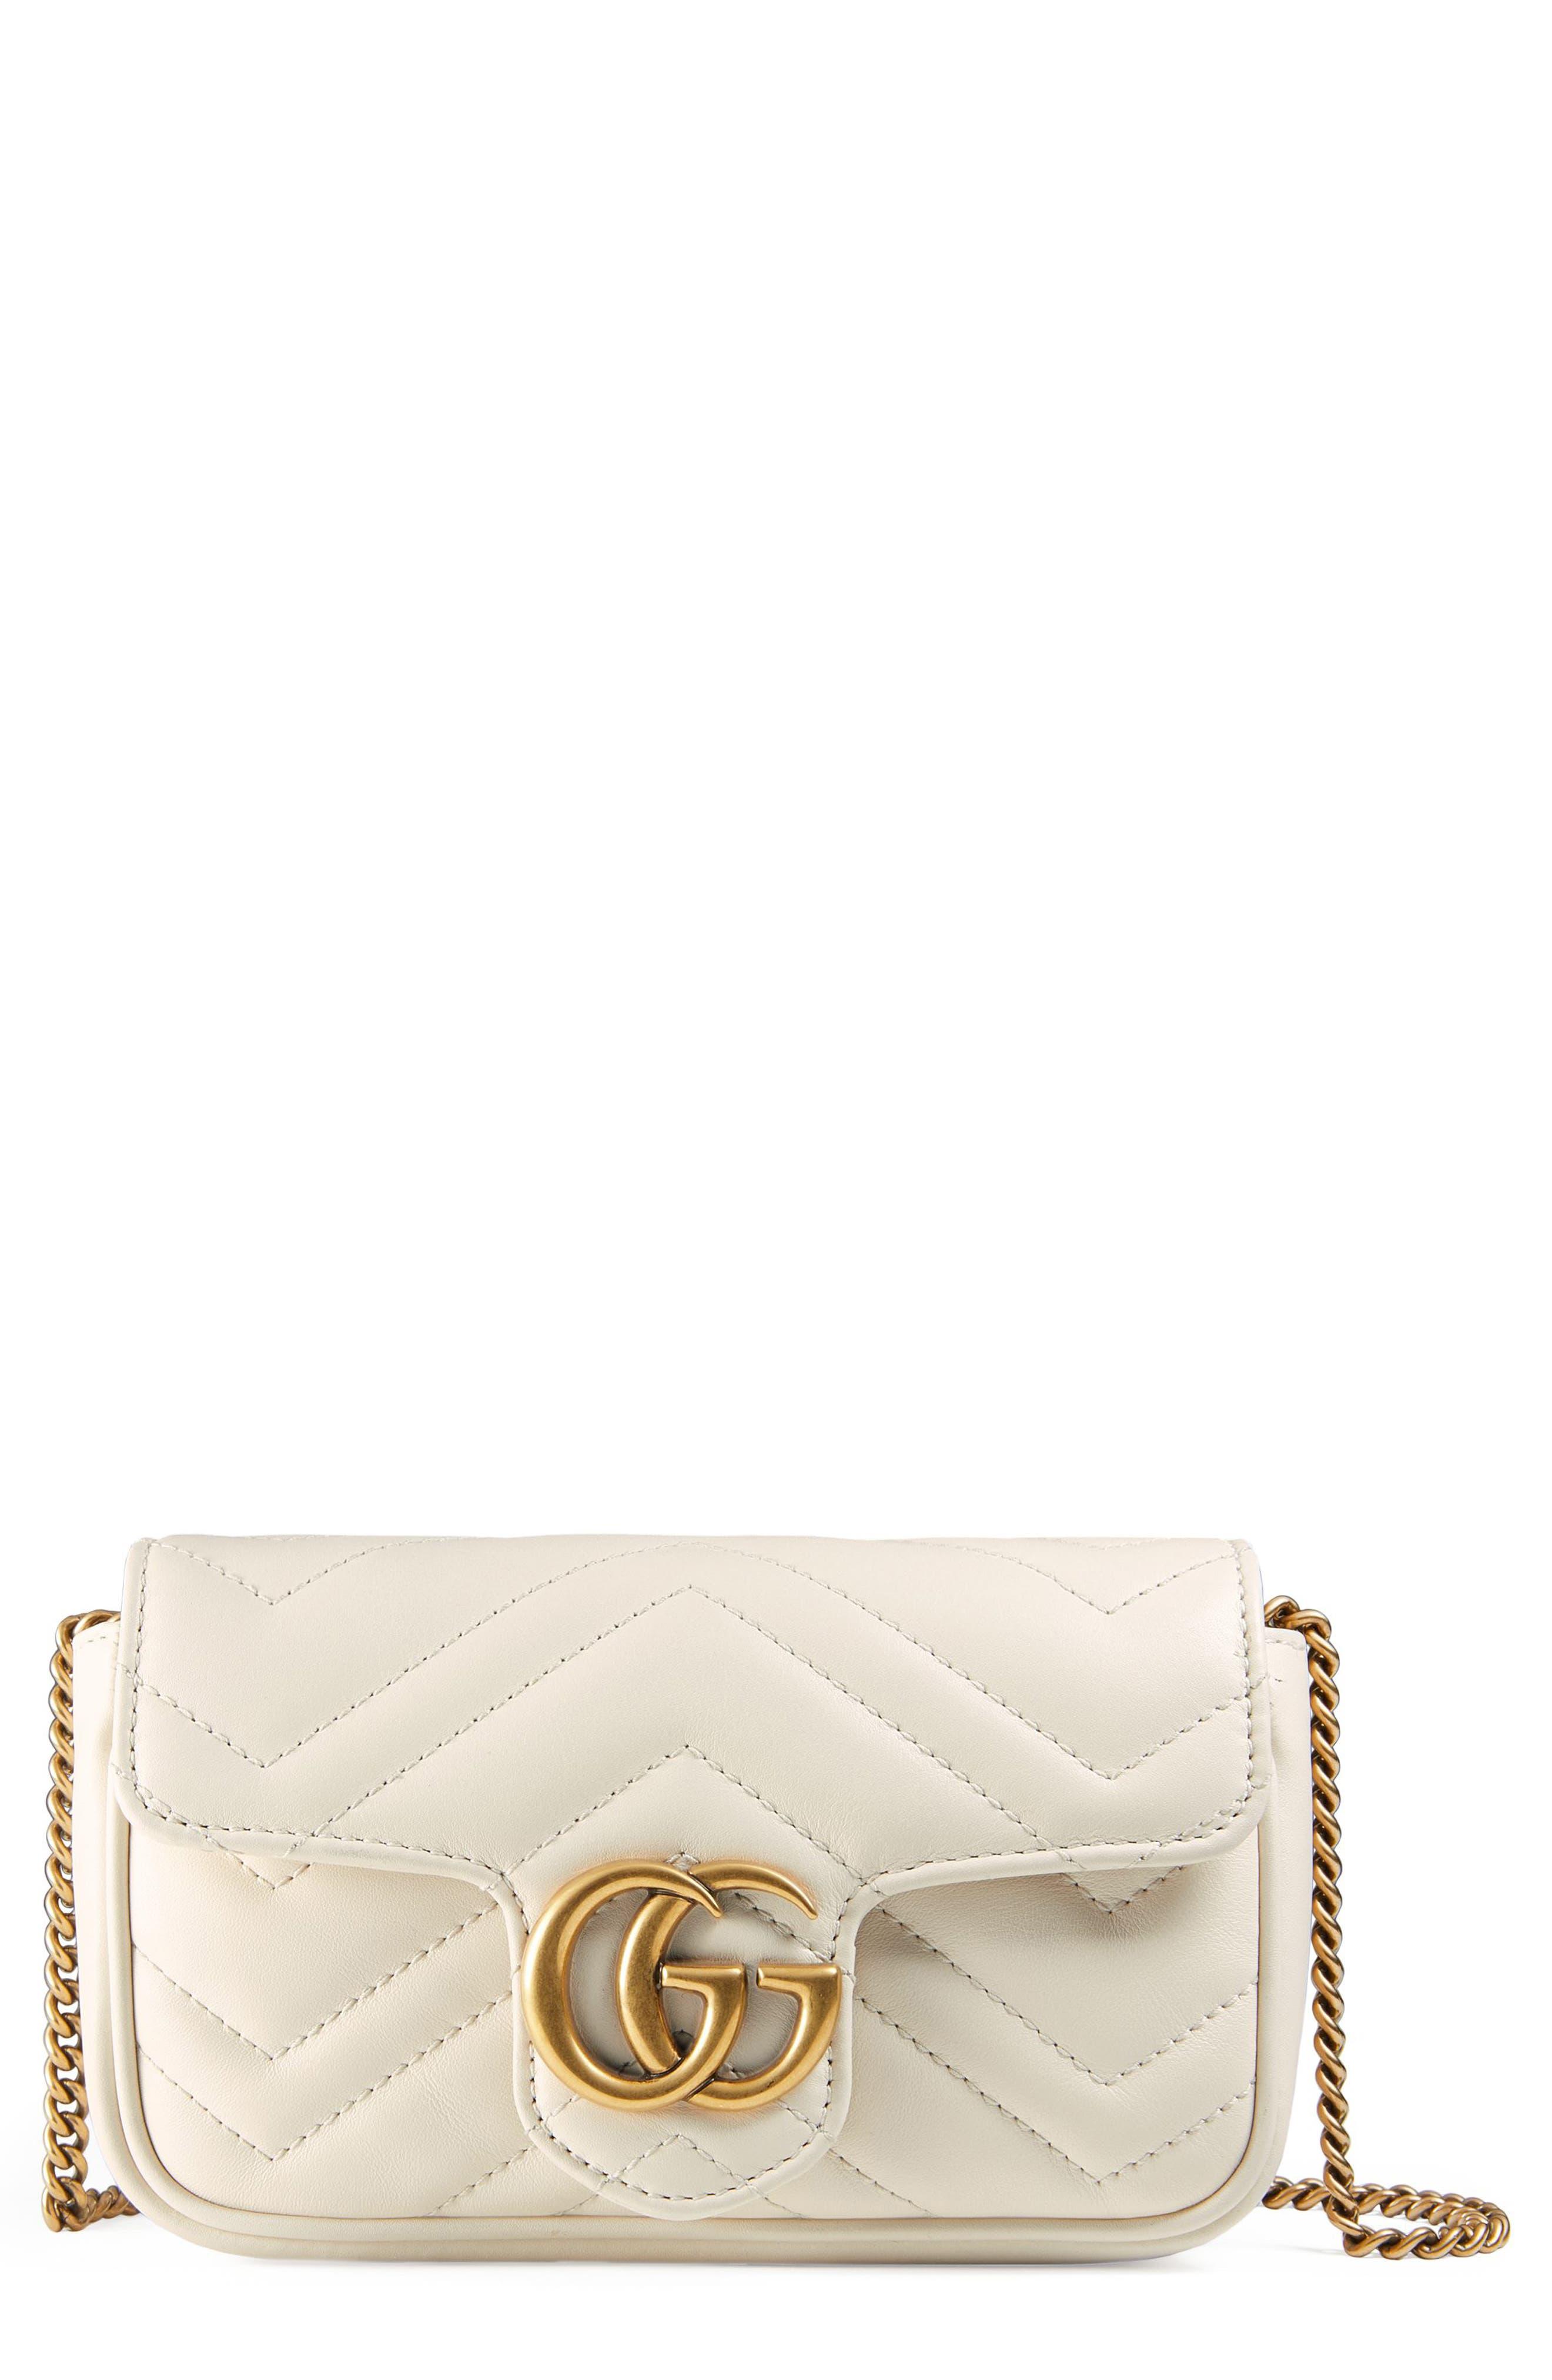 Alternate Image 1 Selected - Gucci Supermini GG Marmont 2.0 Matelassé Leather Shoulder Bag